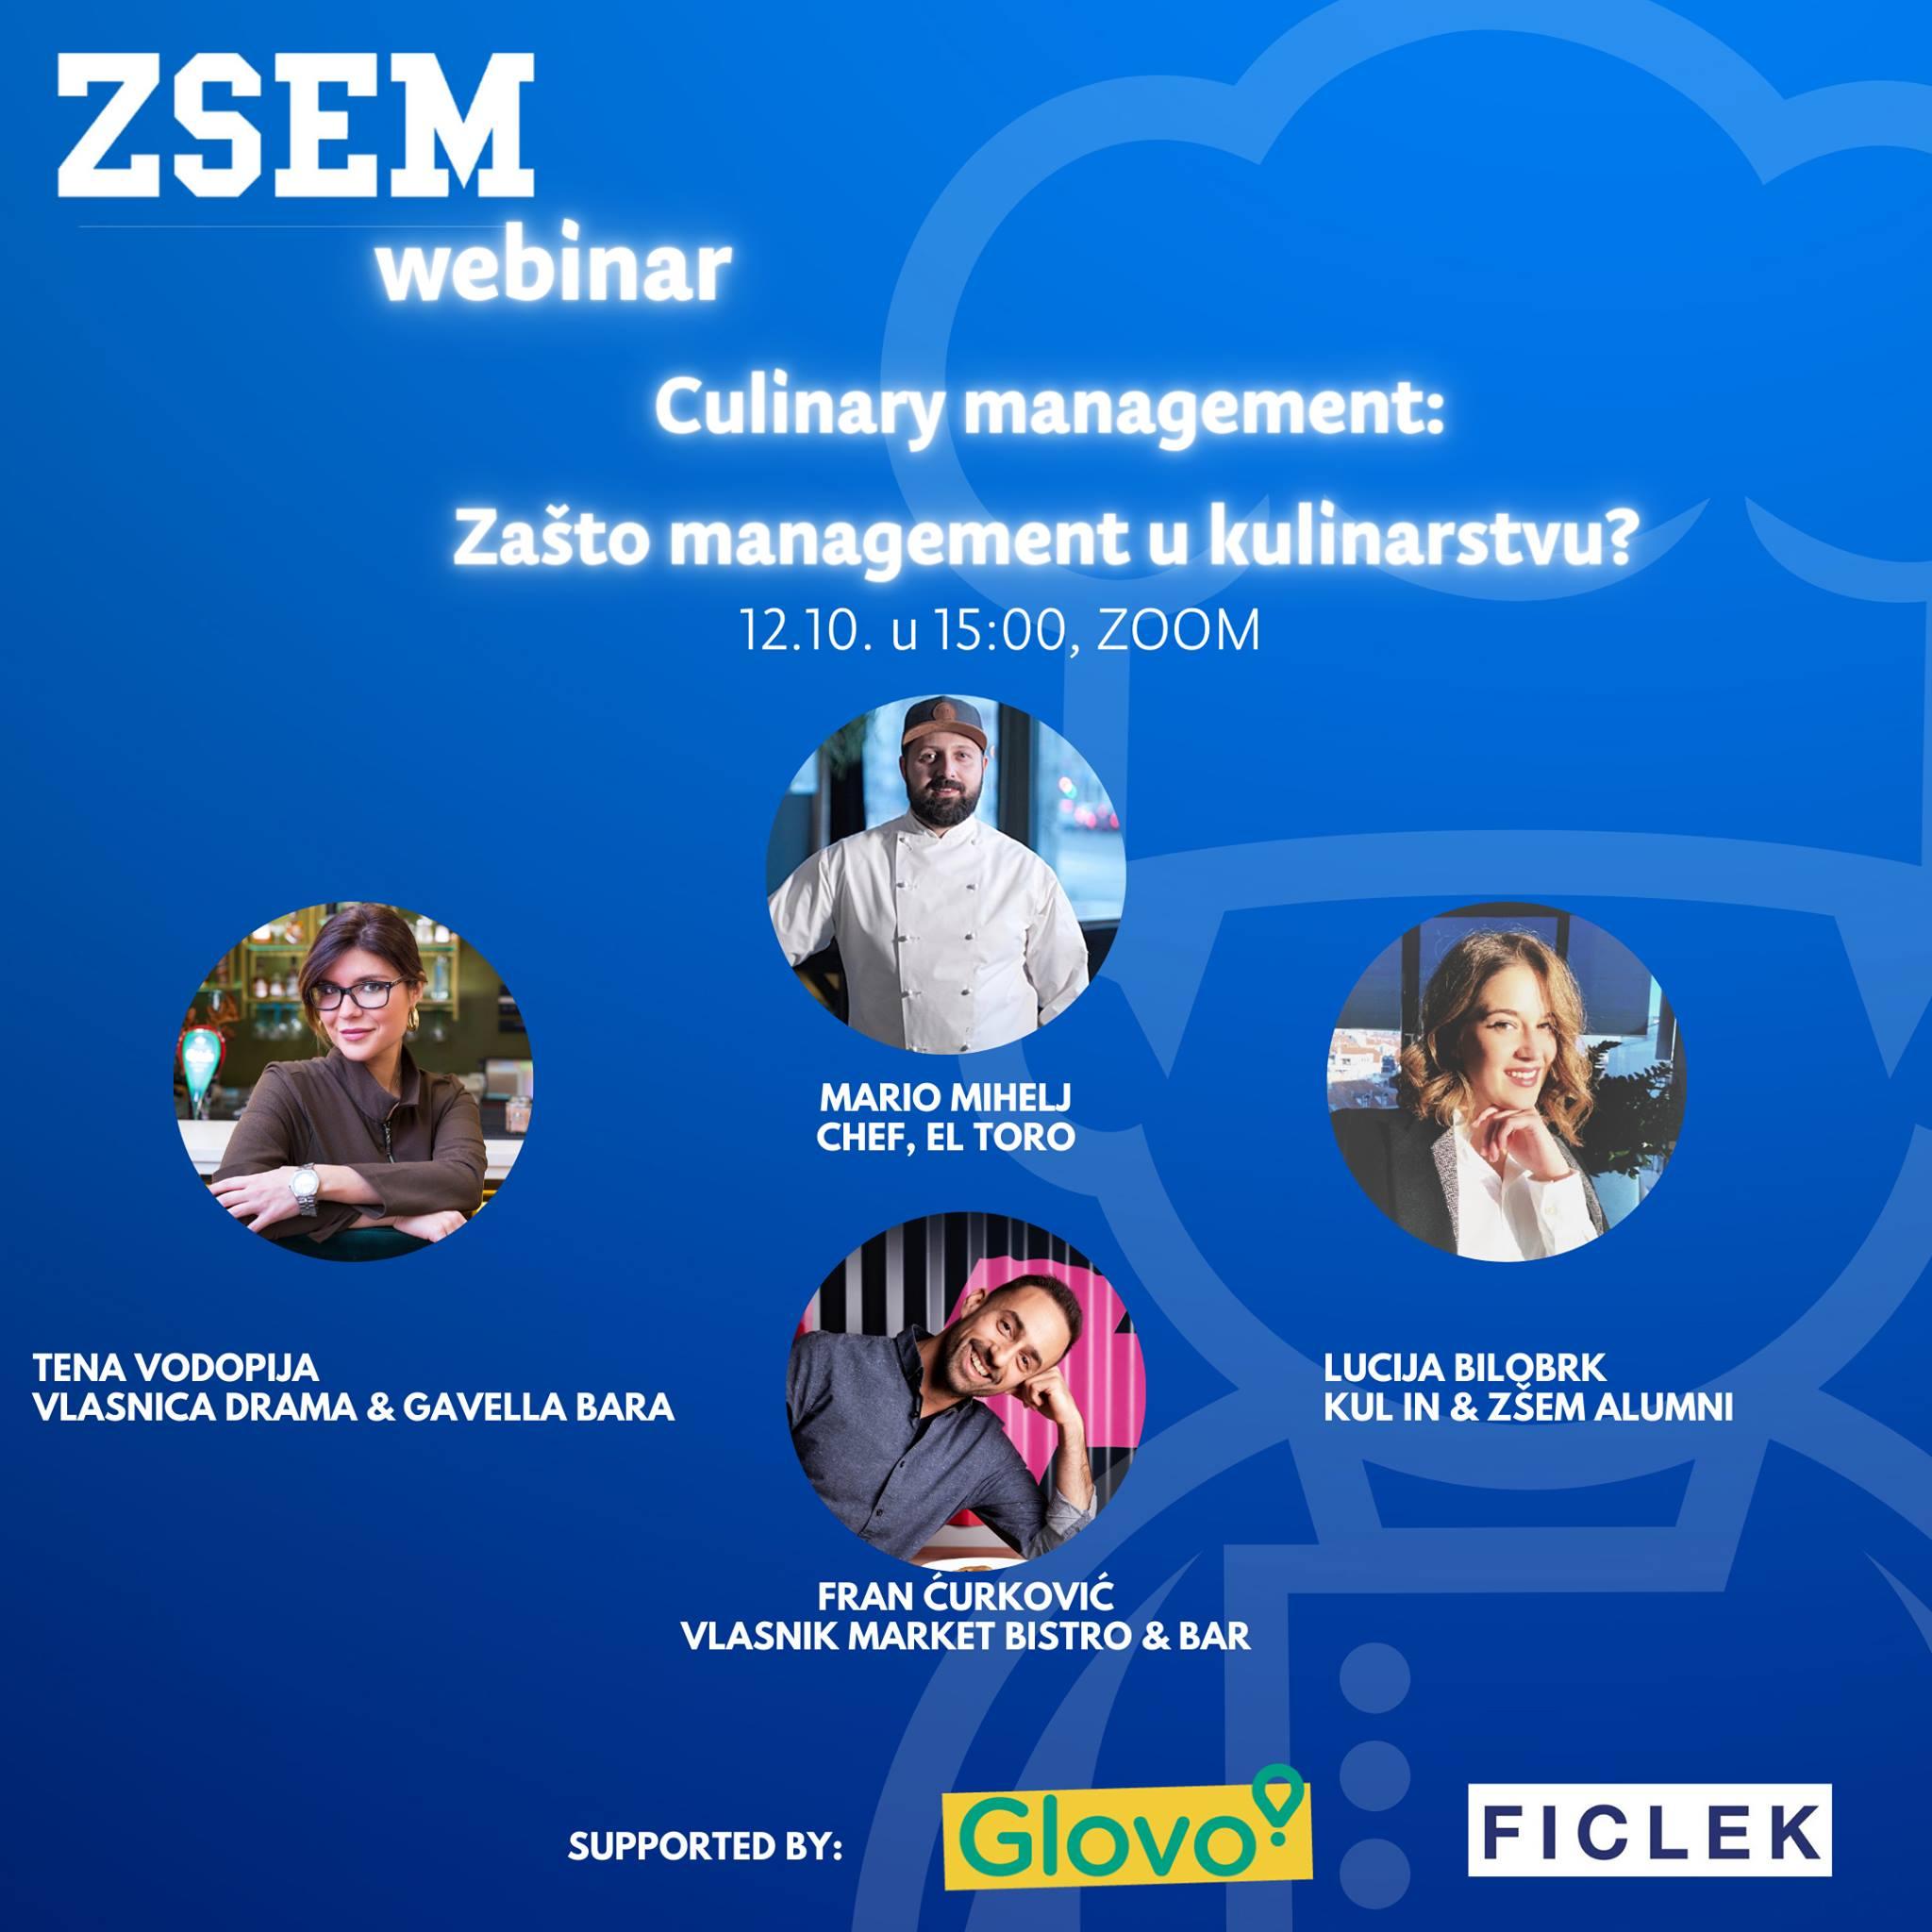 Culinary management webinar